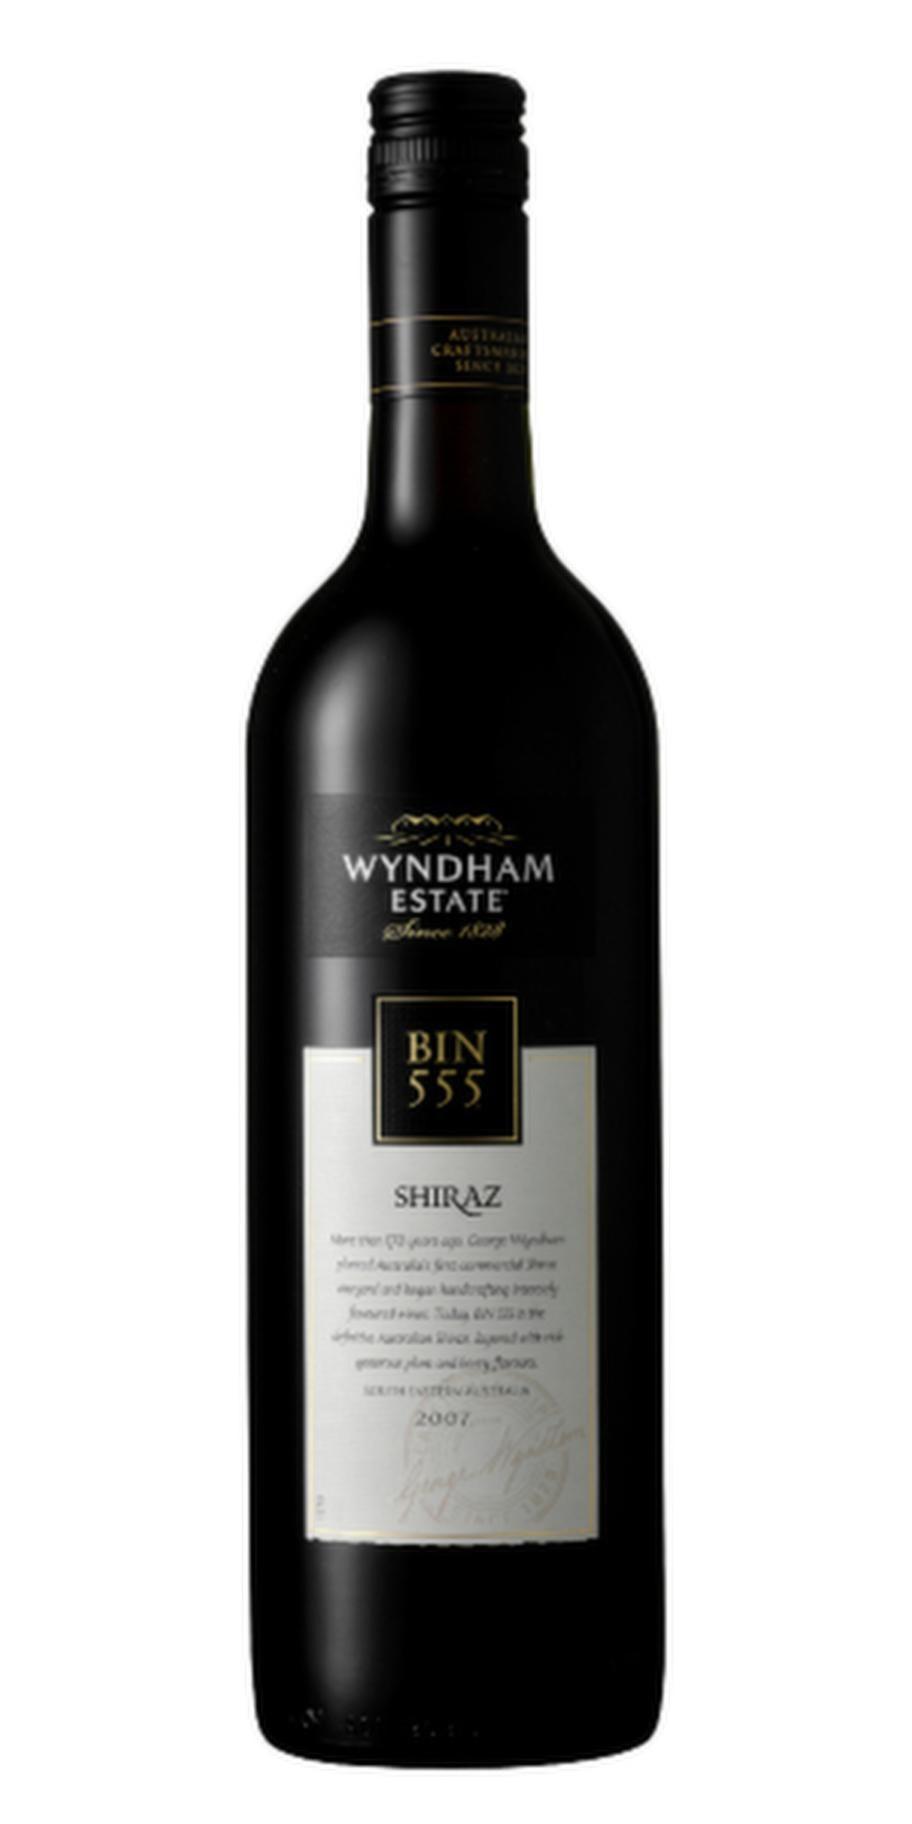 <strong>4 VINER ATT PROVA</strong><br>3. Bin 555 Shiraz Wyndham Estate 2010 (6829) Australien, 99 kr.